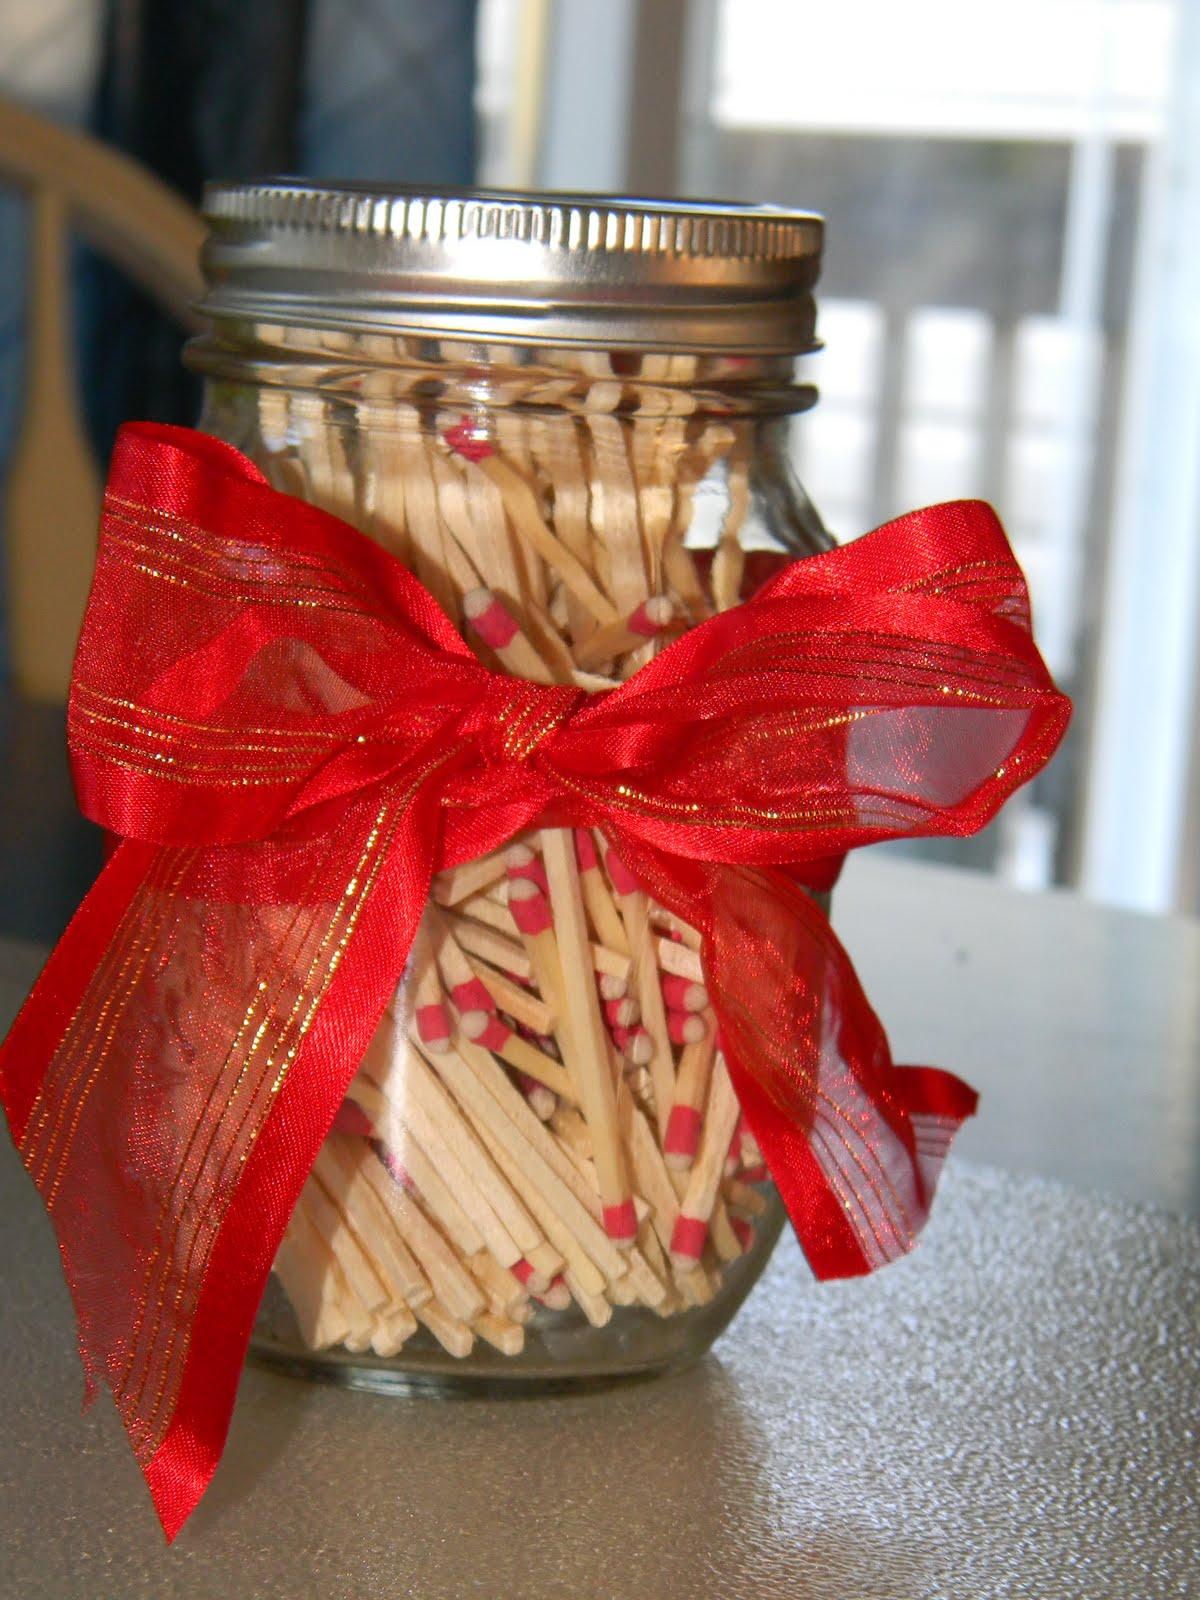 JADA ROO AND HER BROTHER TOO: A Homemade Christmas Gift ...